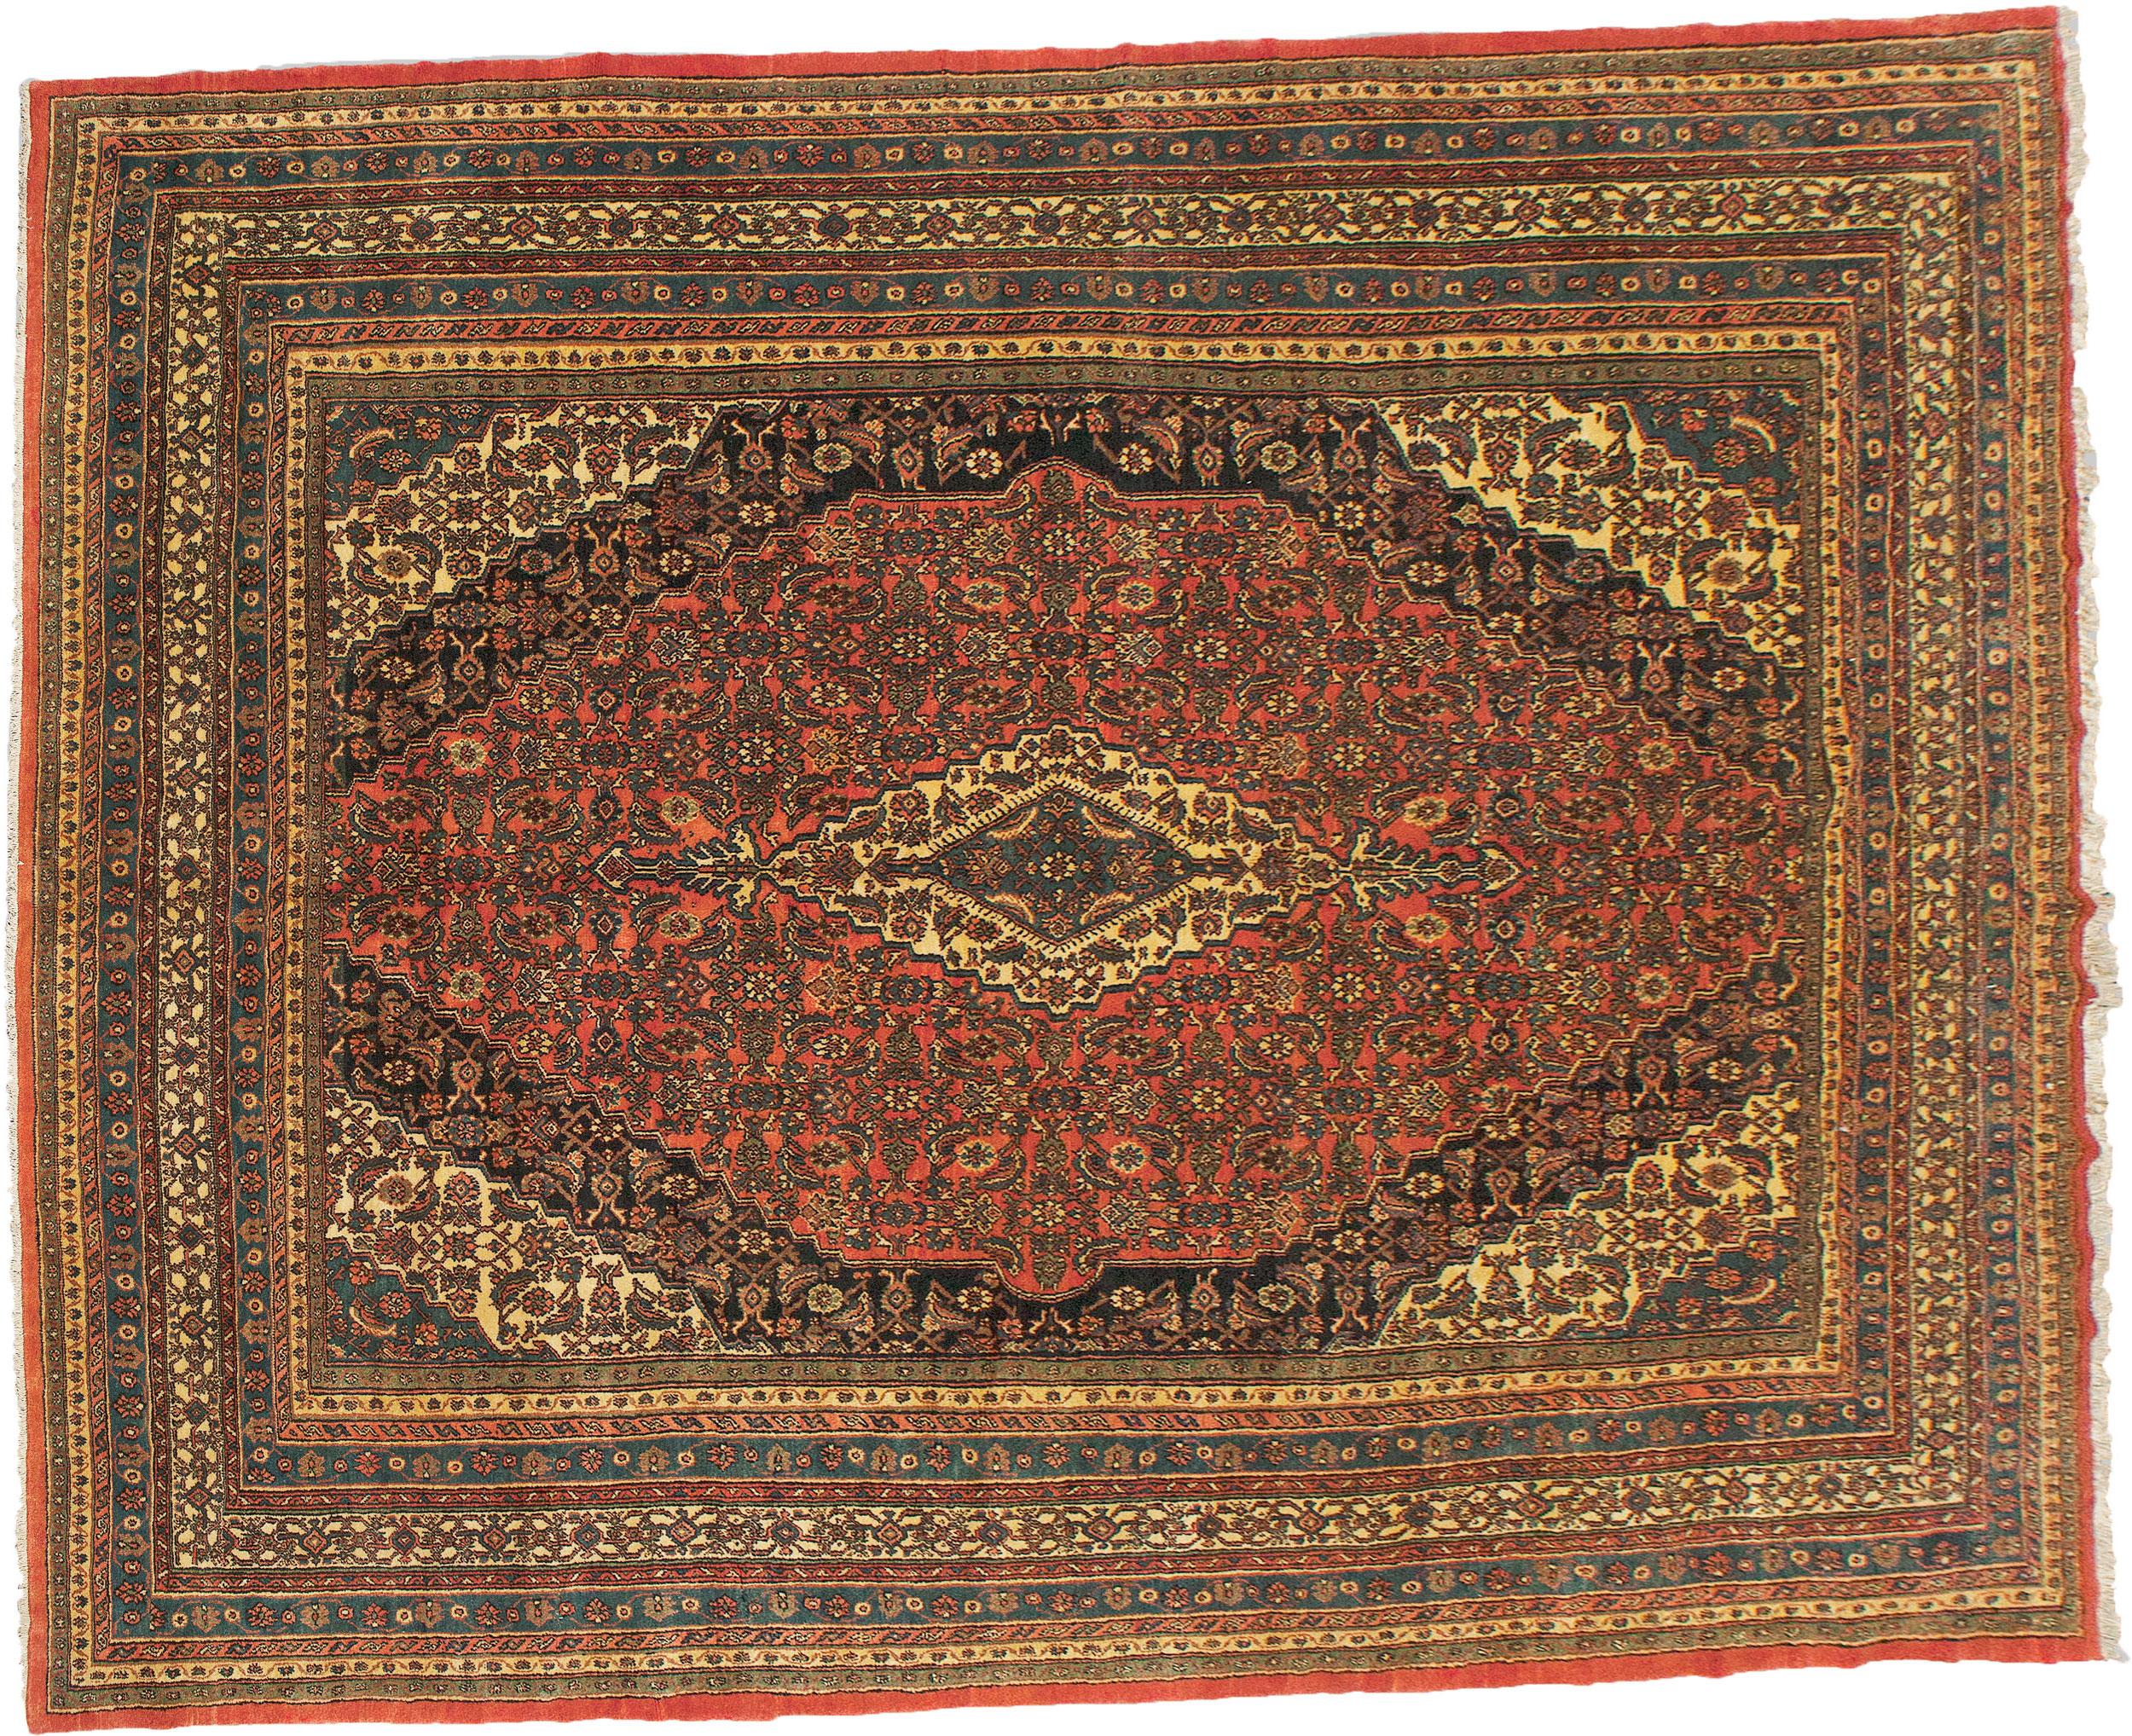 Vintage Bibikabad Carpet 420x320cm